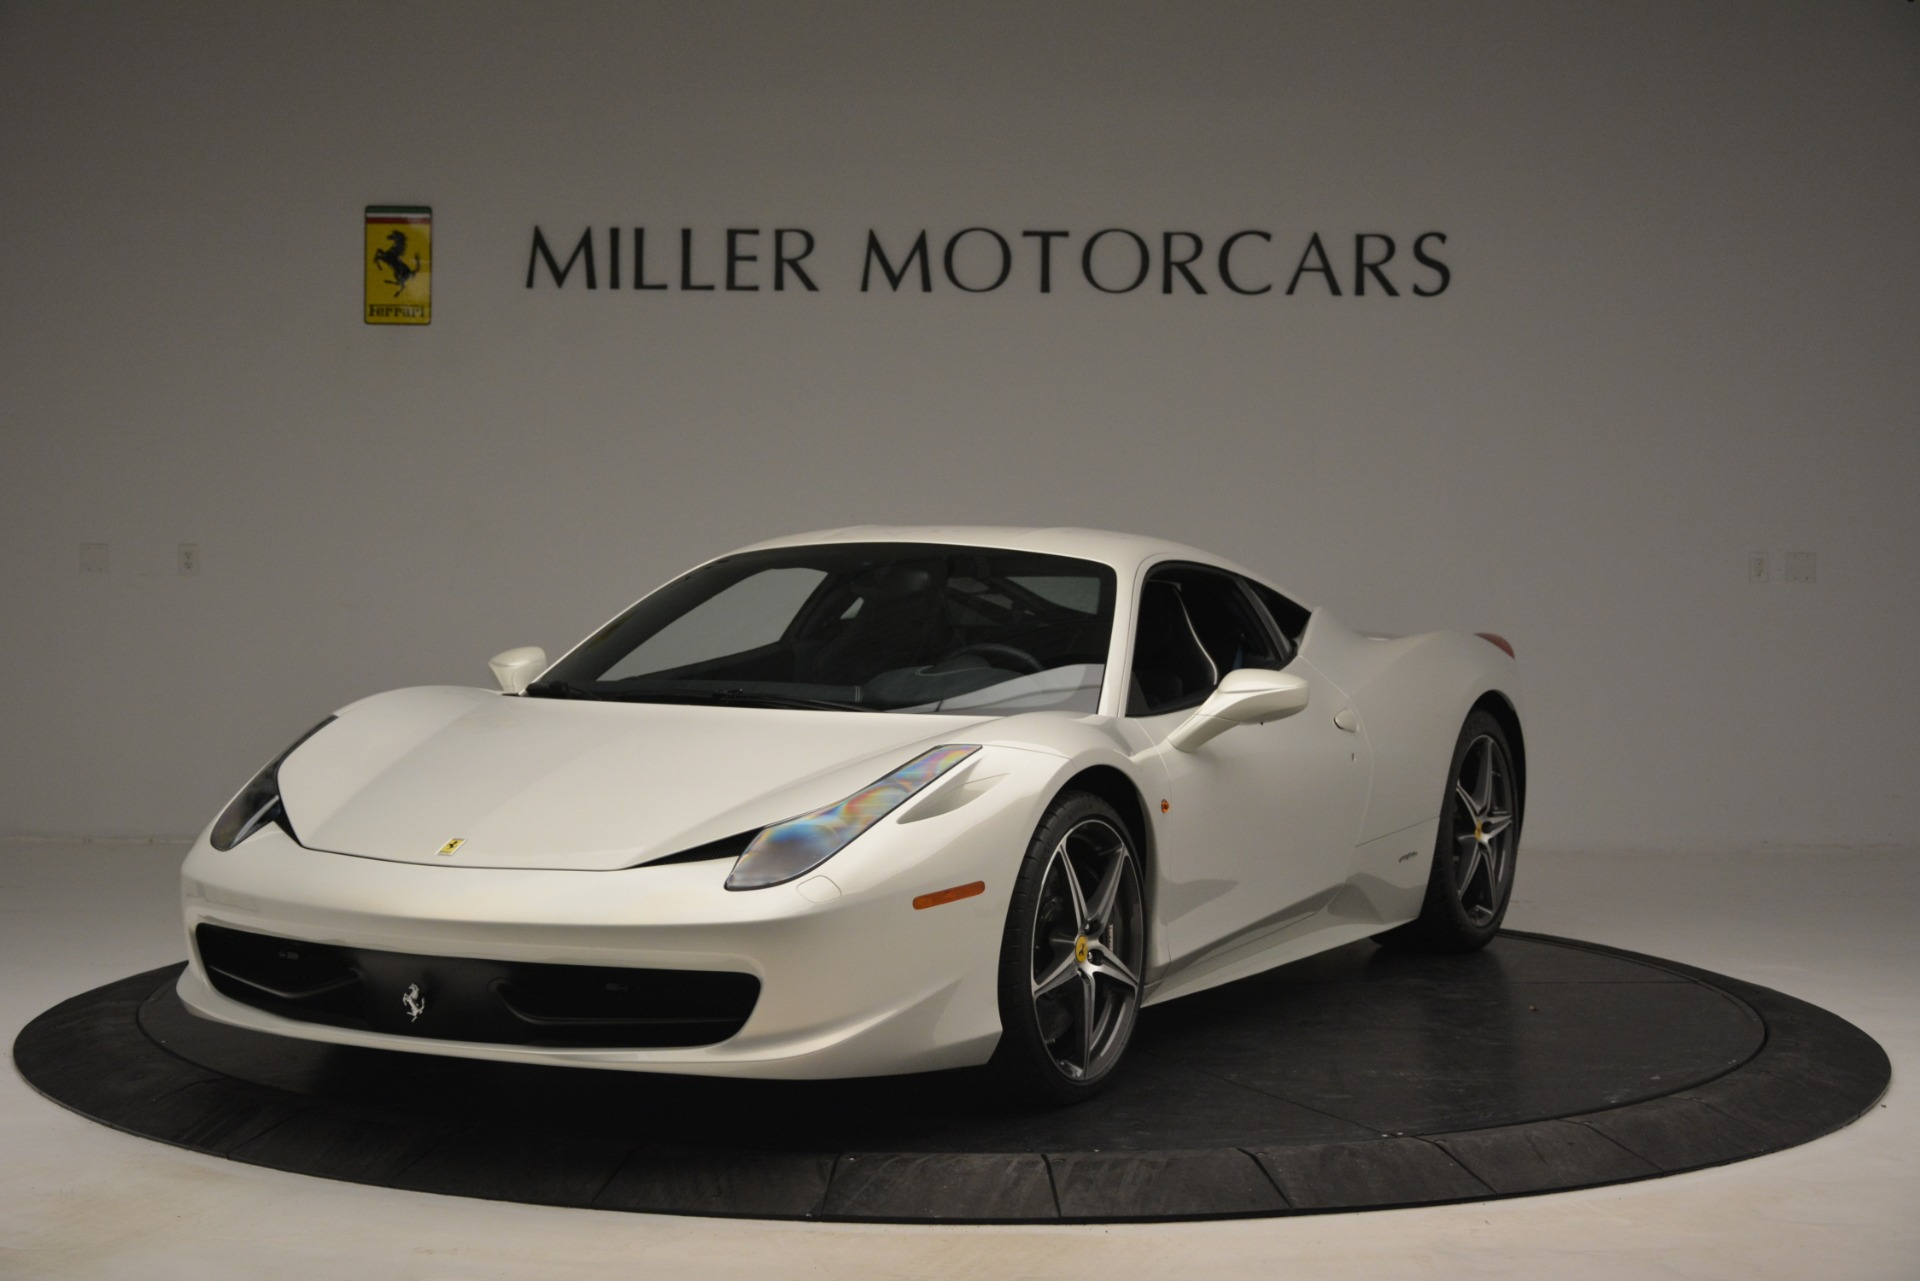 Used 2014 Ferrari 458 Italia for sale Sold at Bentley Greenwich in Greenwich CT 06830 1